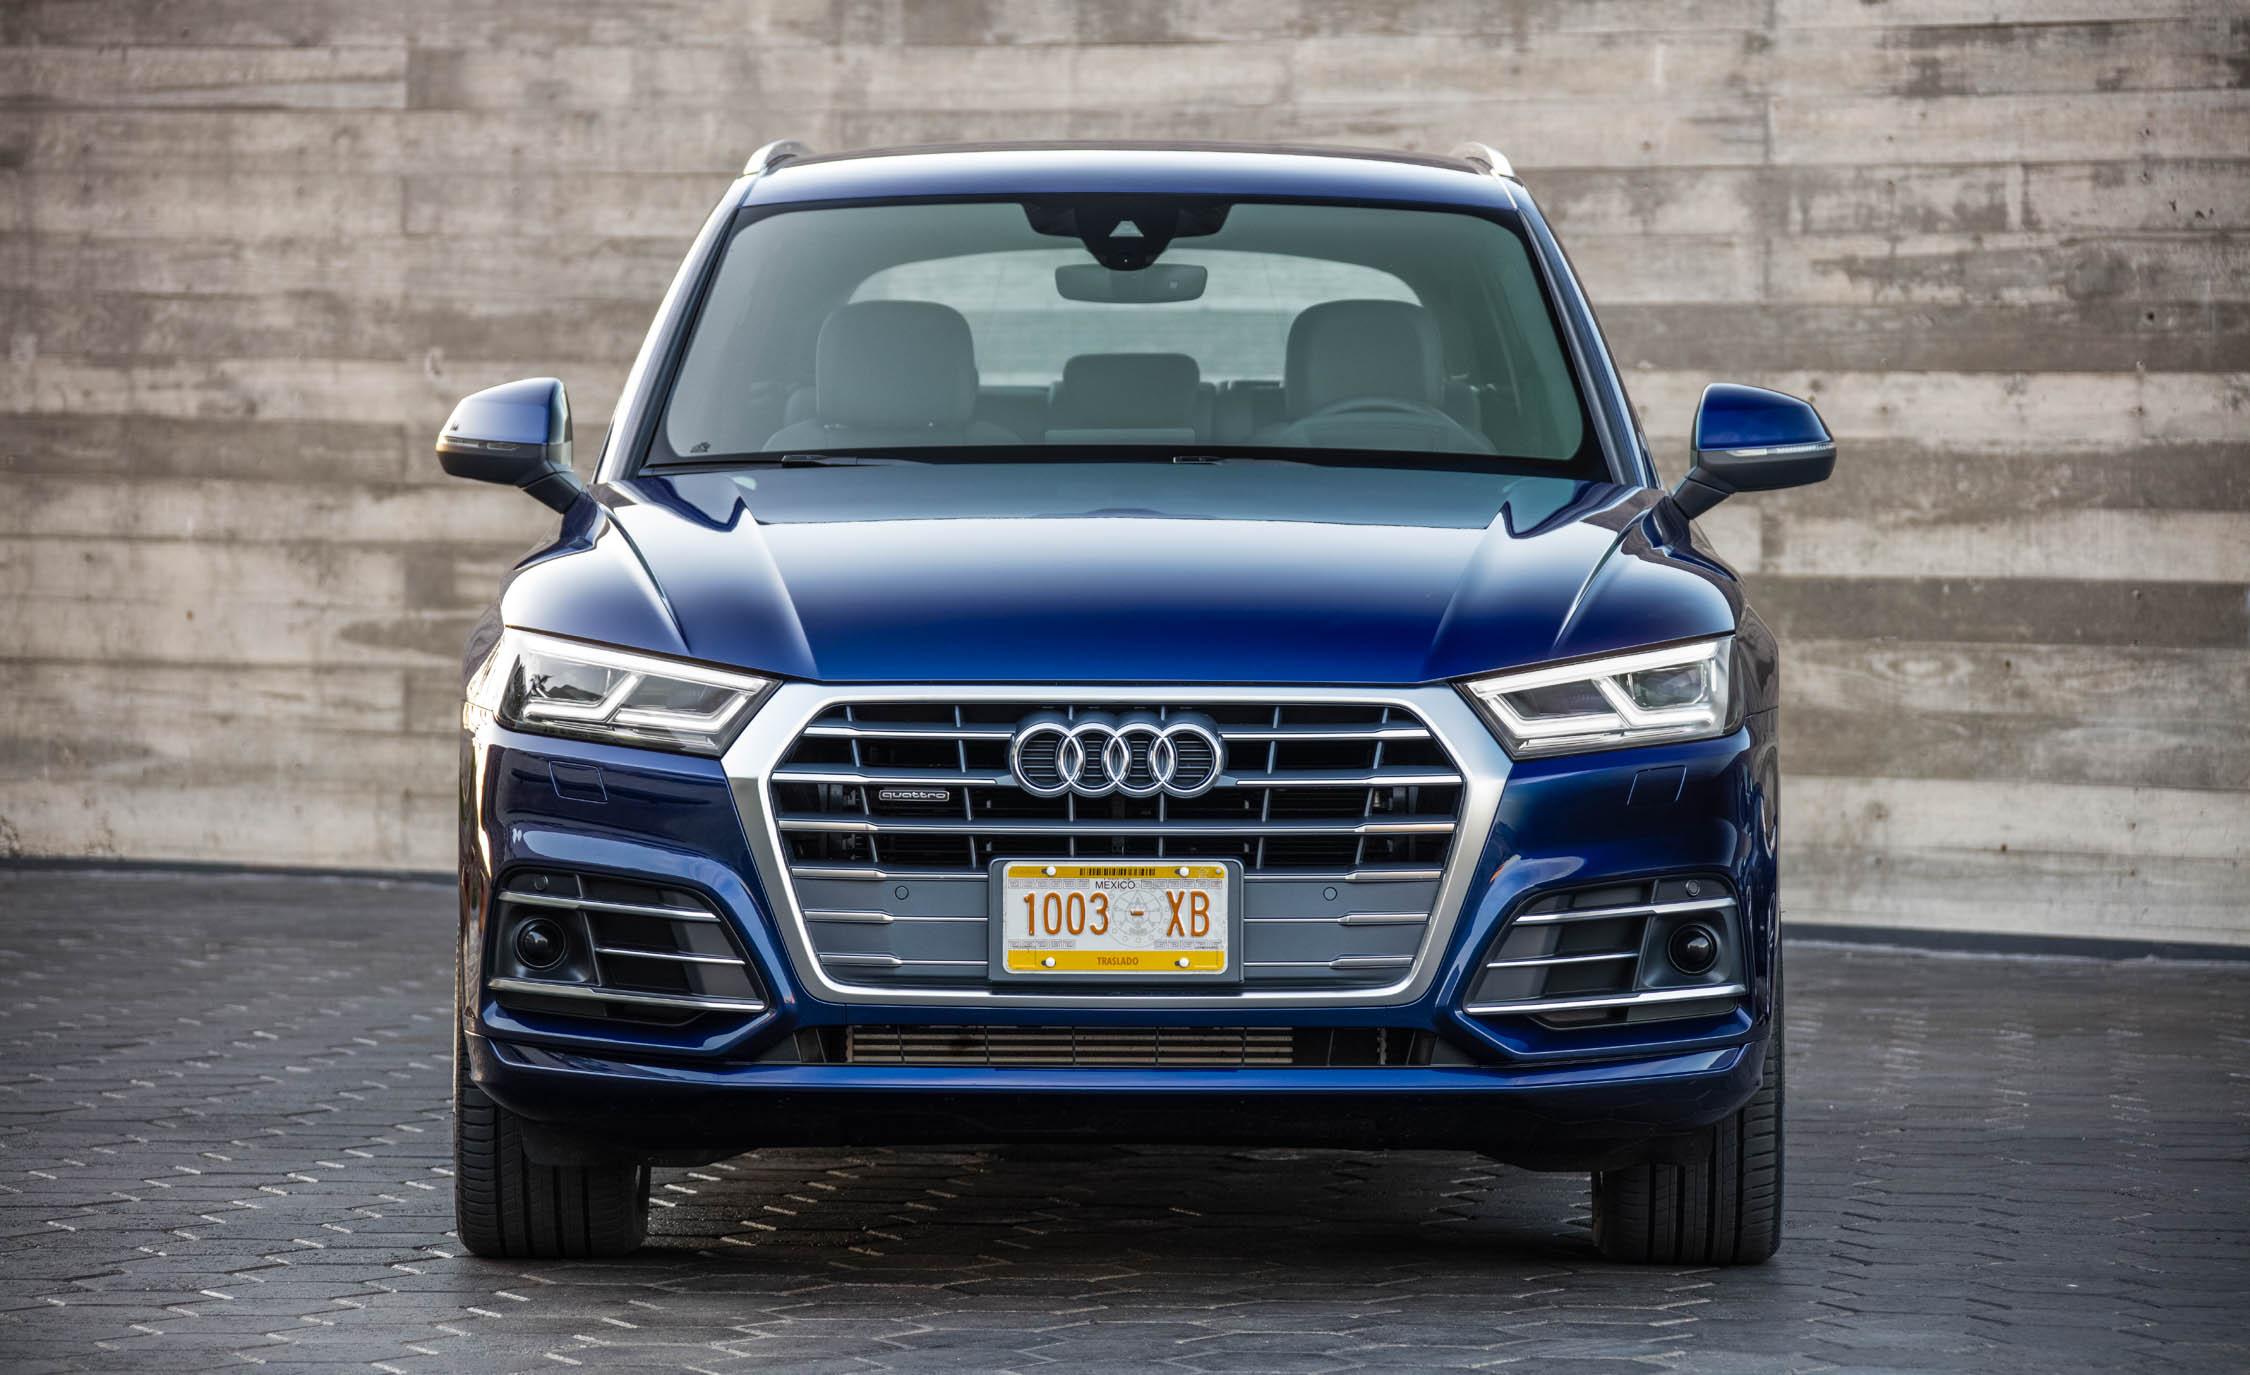 2018 Audi Q (View 18 of 40)